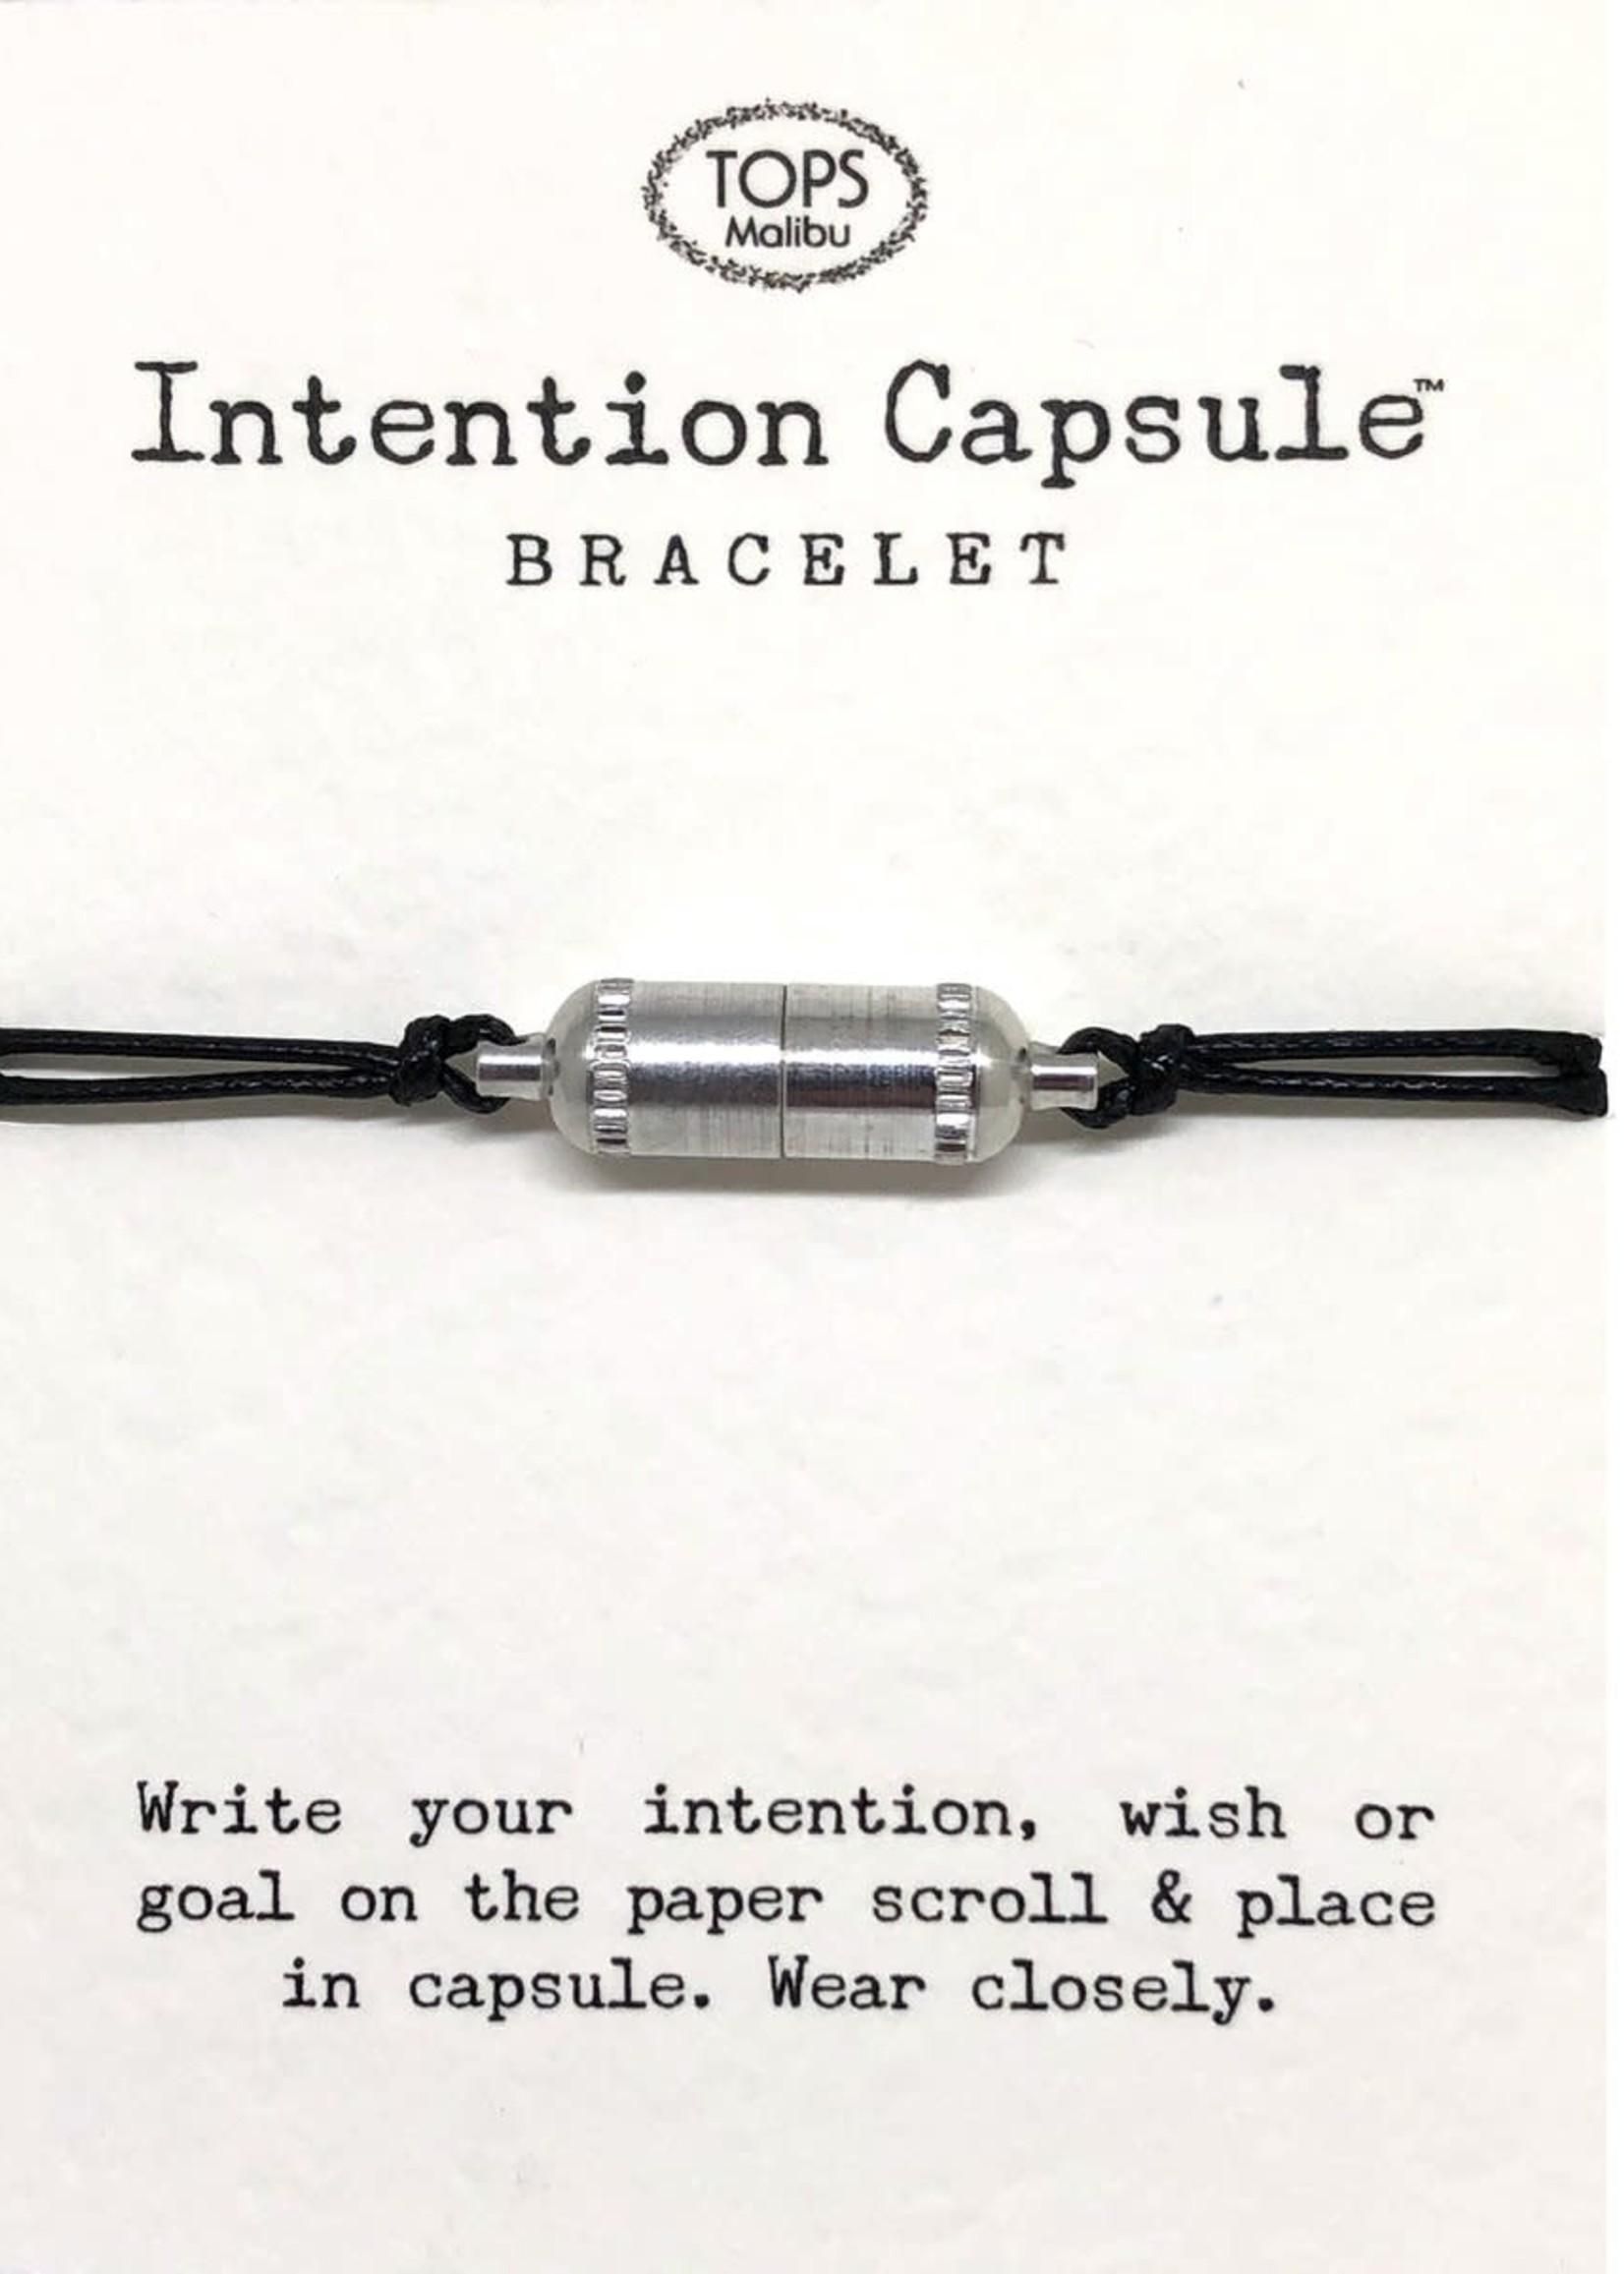 Intention Capsule Bracelet